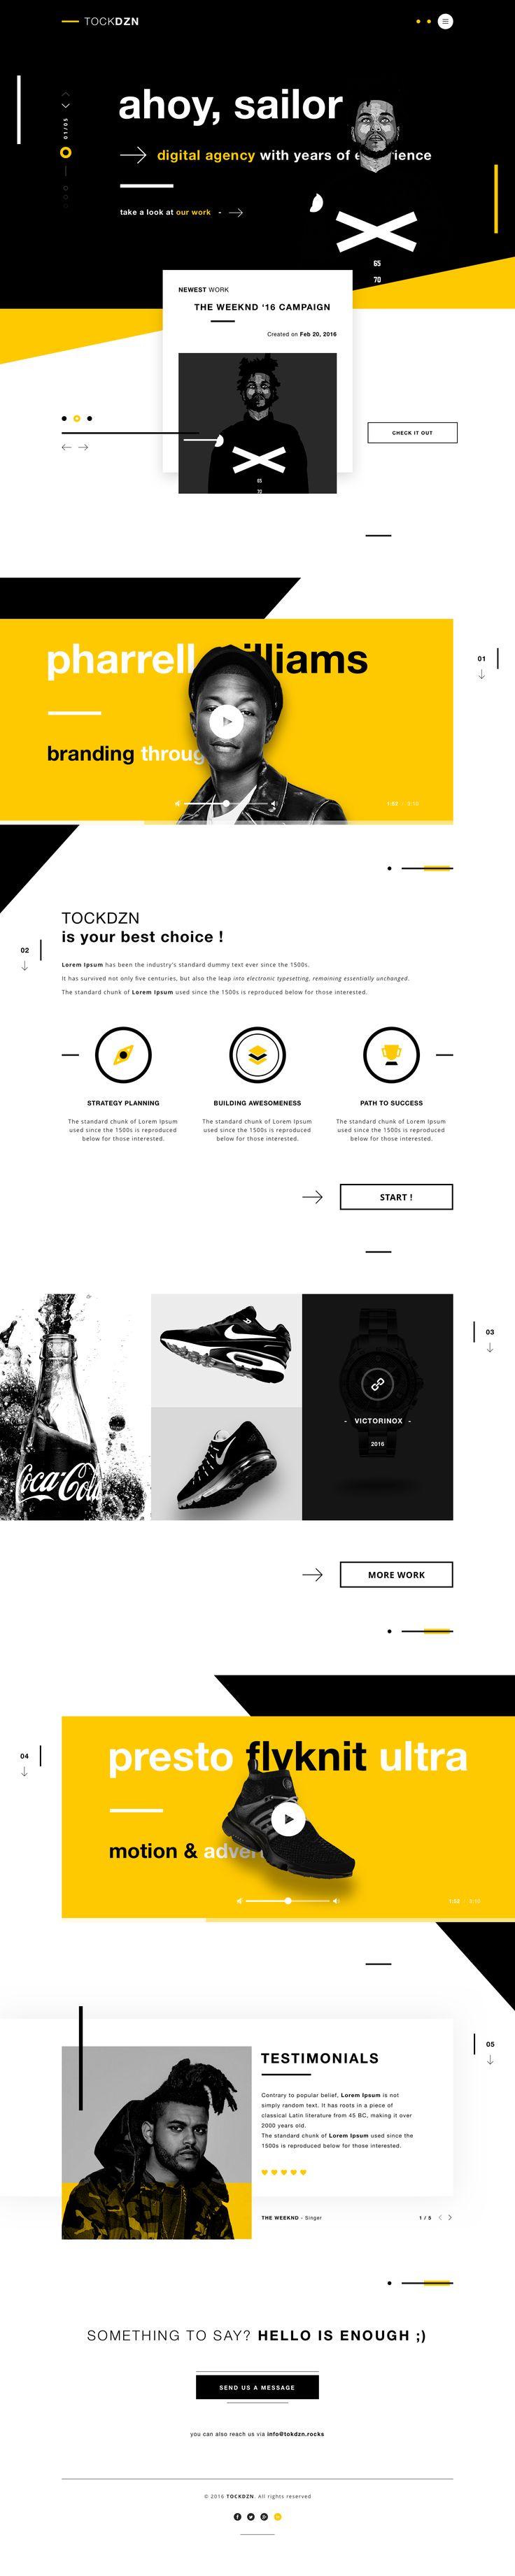 Tockdzn creative agency landing page website webdesign ui design interface dribbble full